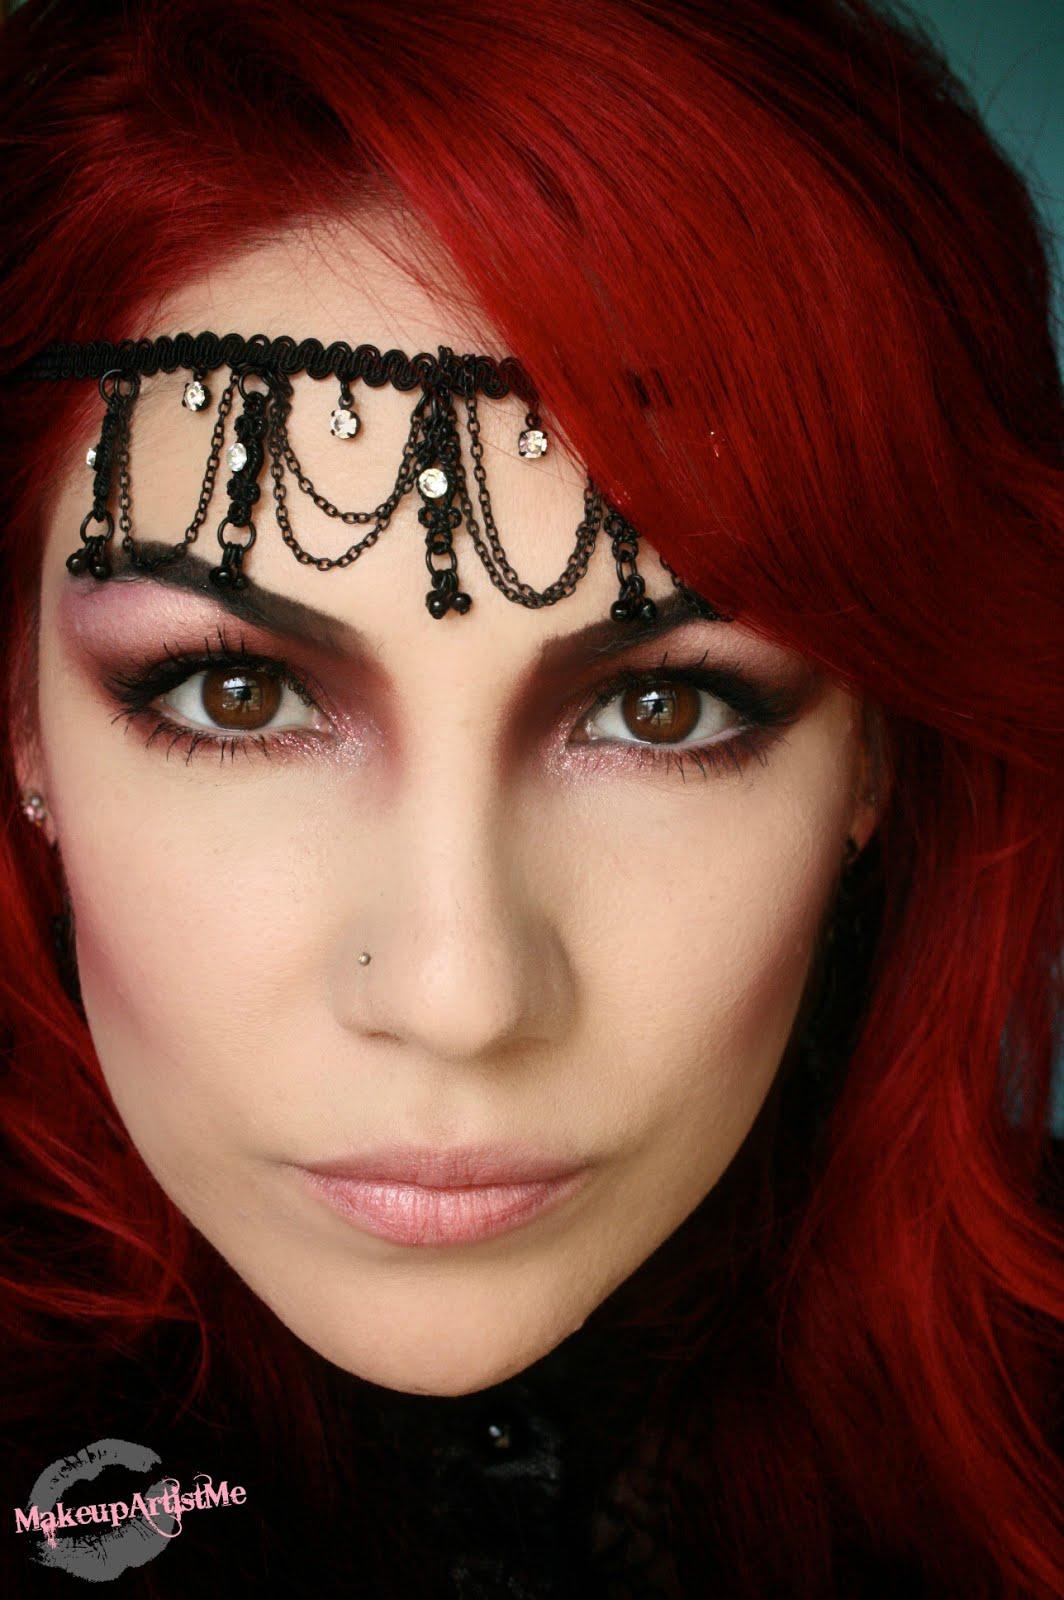 Makeup Artist Youtube: Make-up Artist Me!: Mauve Queen Makeup Look Tutorial